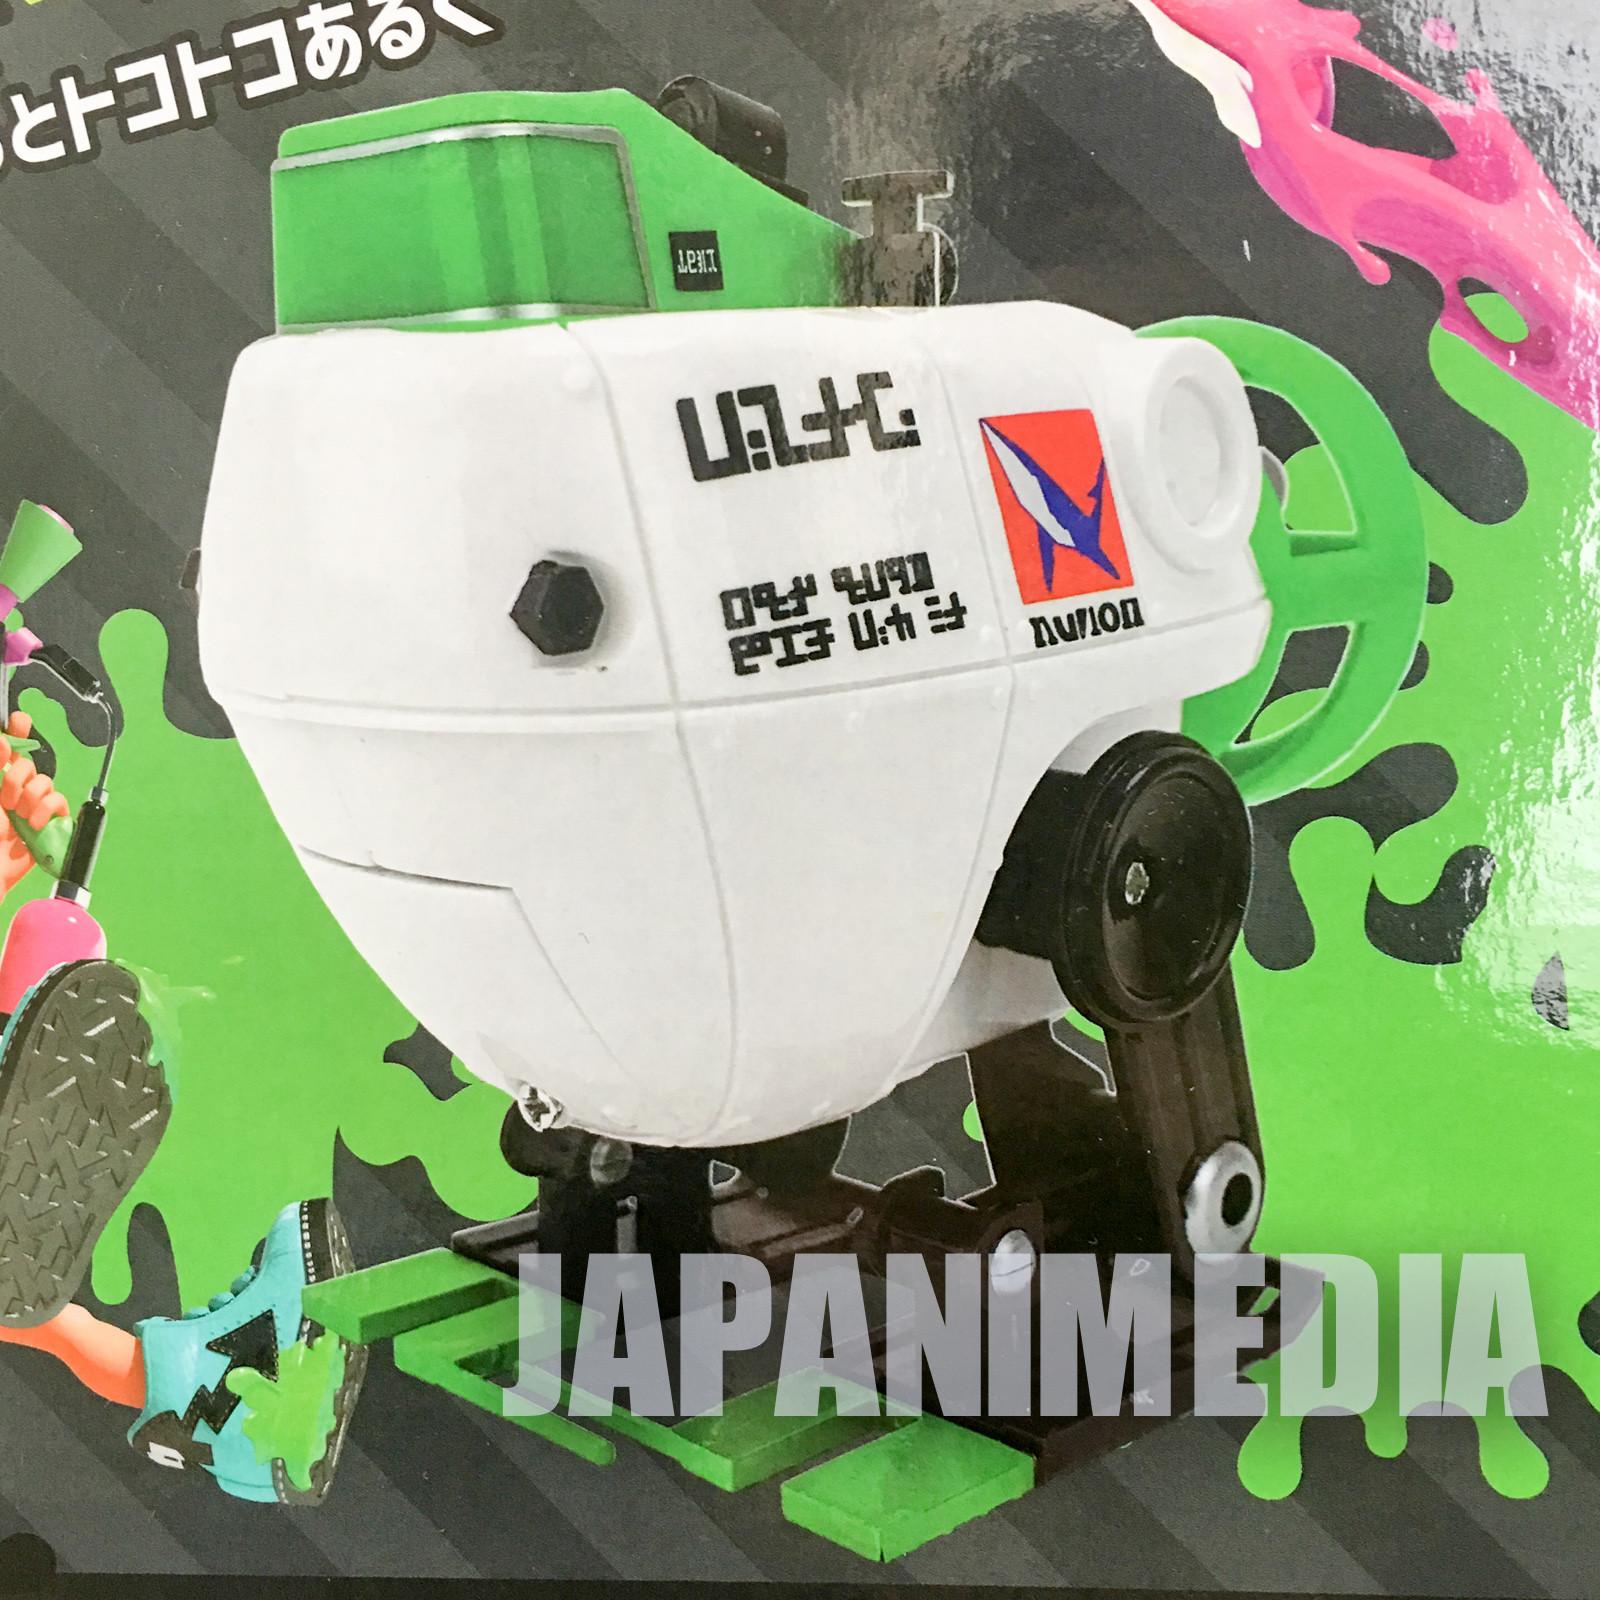 Splatoon 2 Autobomb Green Battery-powered Movable Figure Nintendo Switch